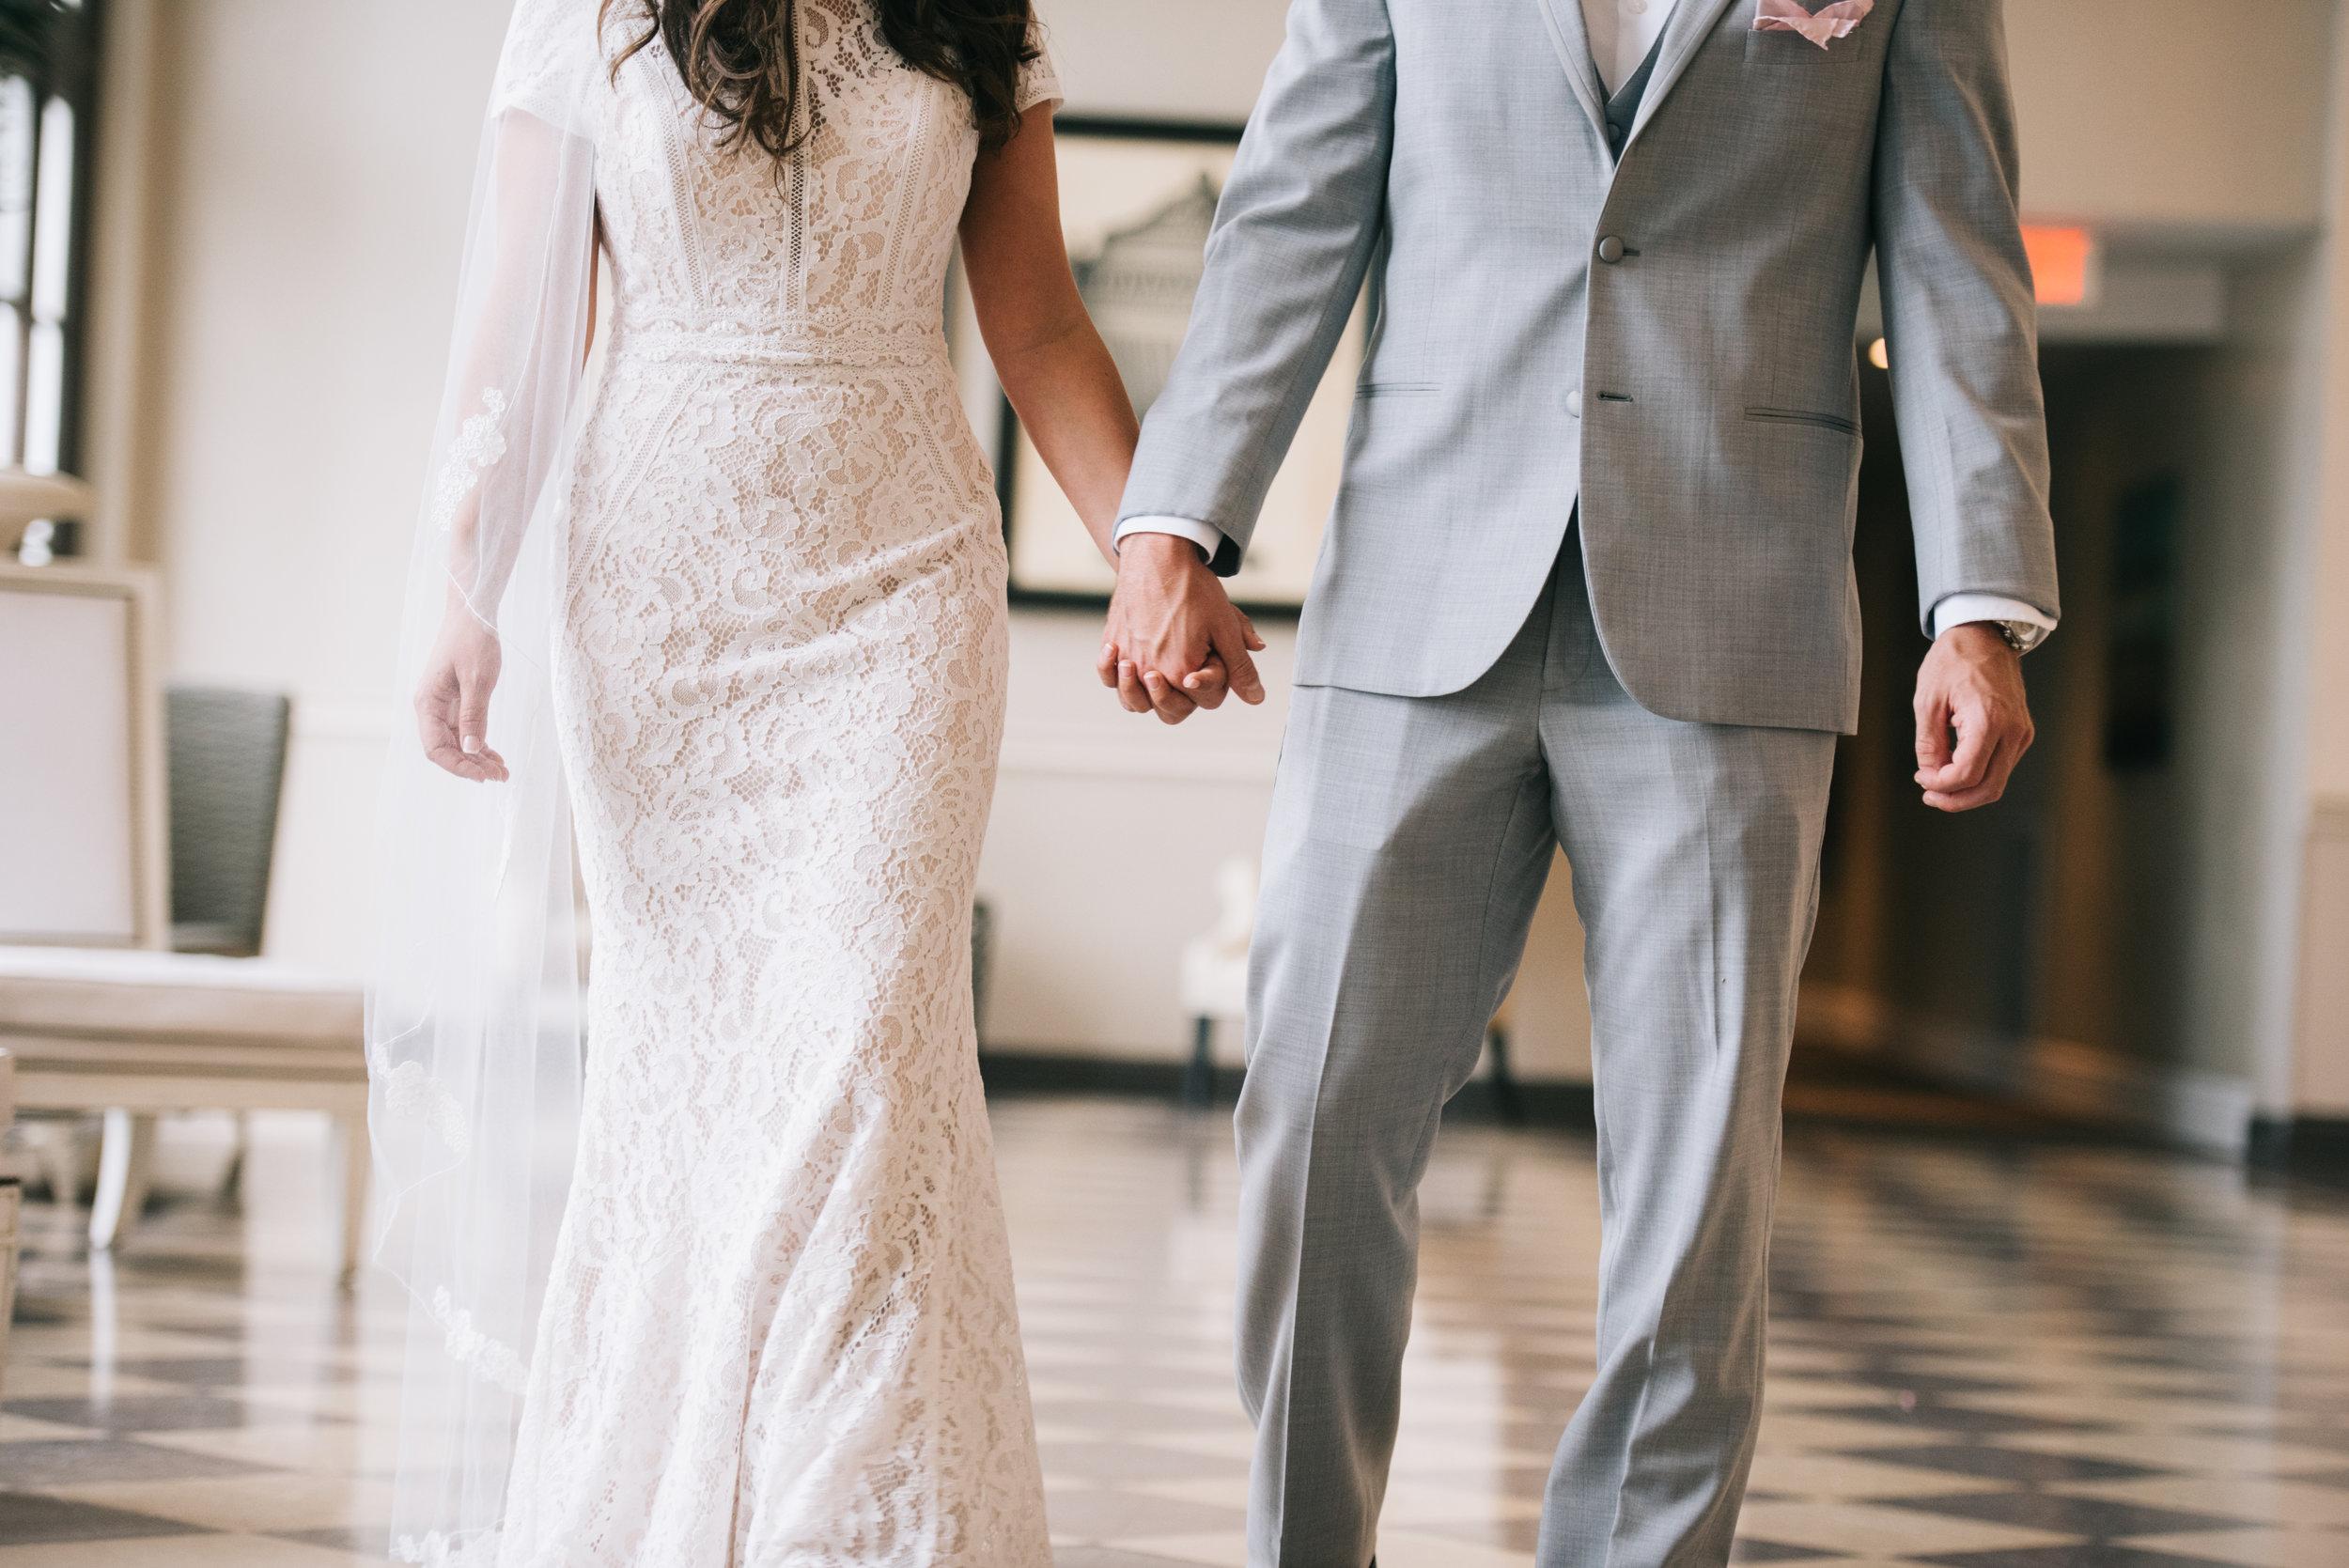 WeddingPhotos | NJPhotographer | Highlights-4-35.jpg